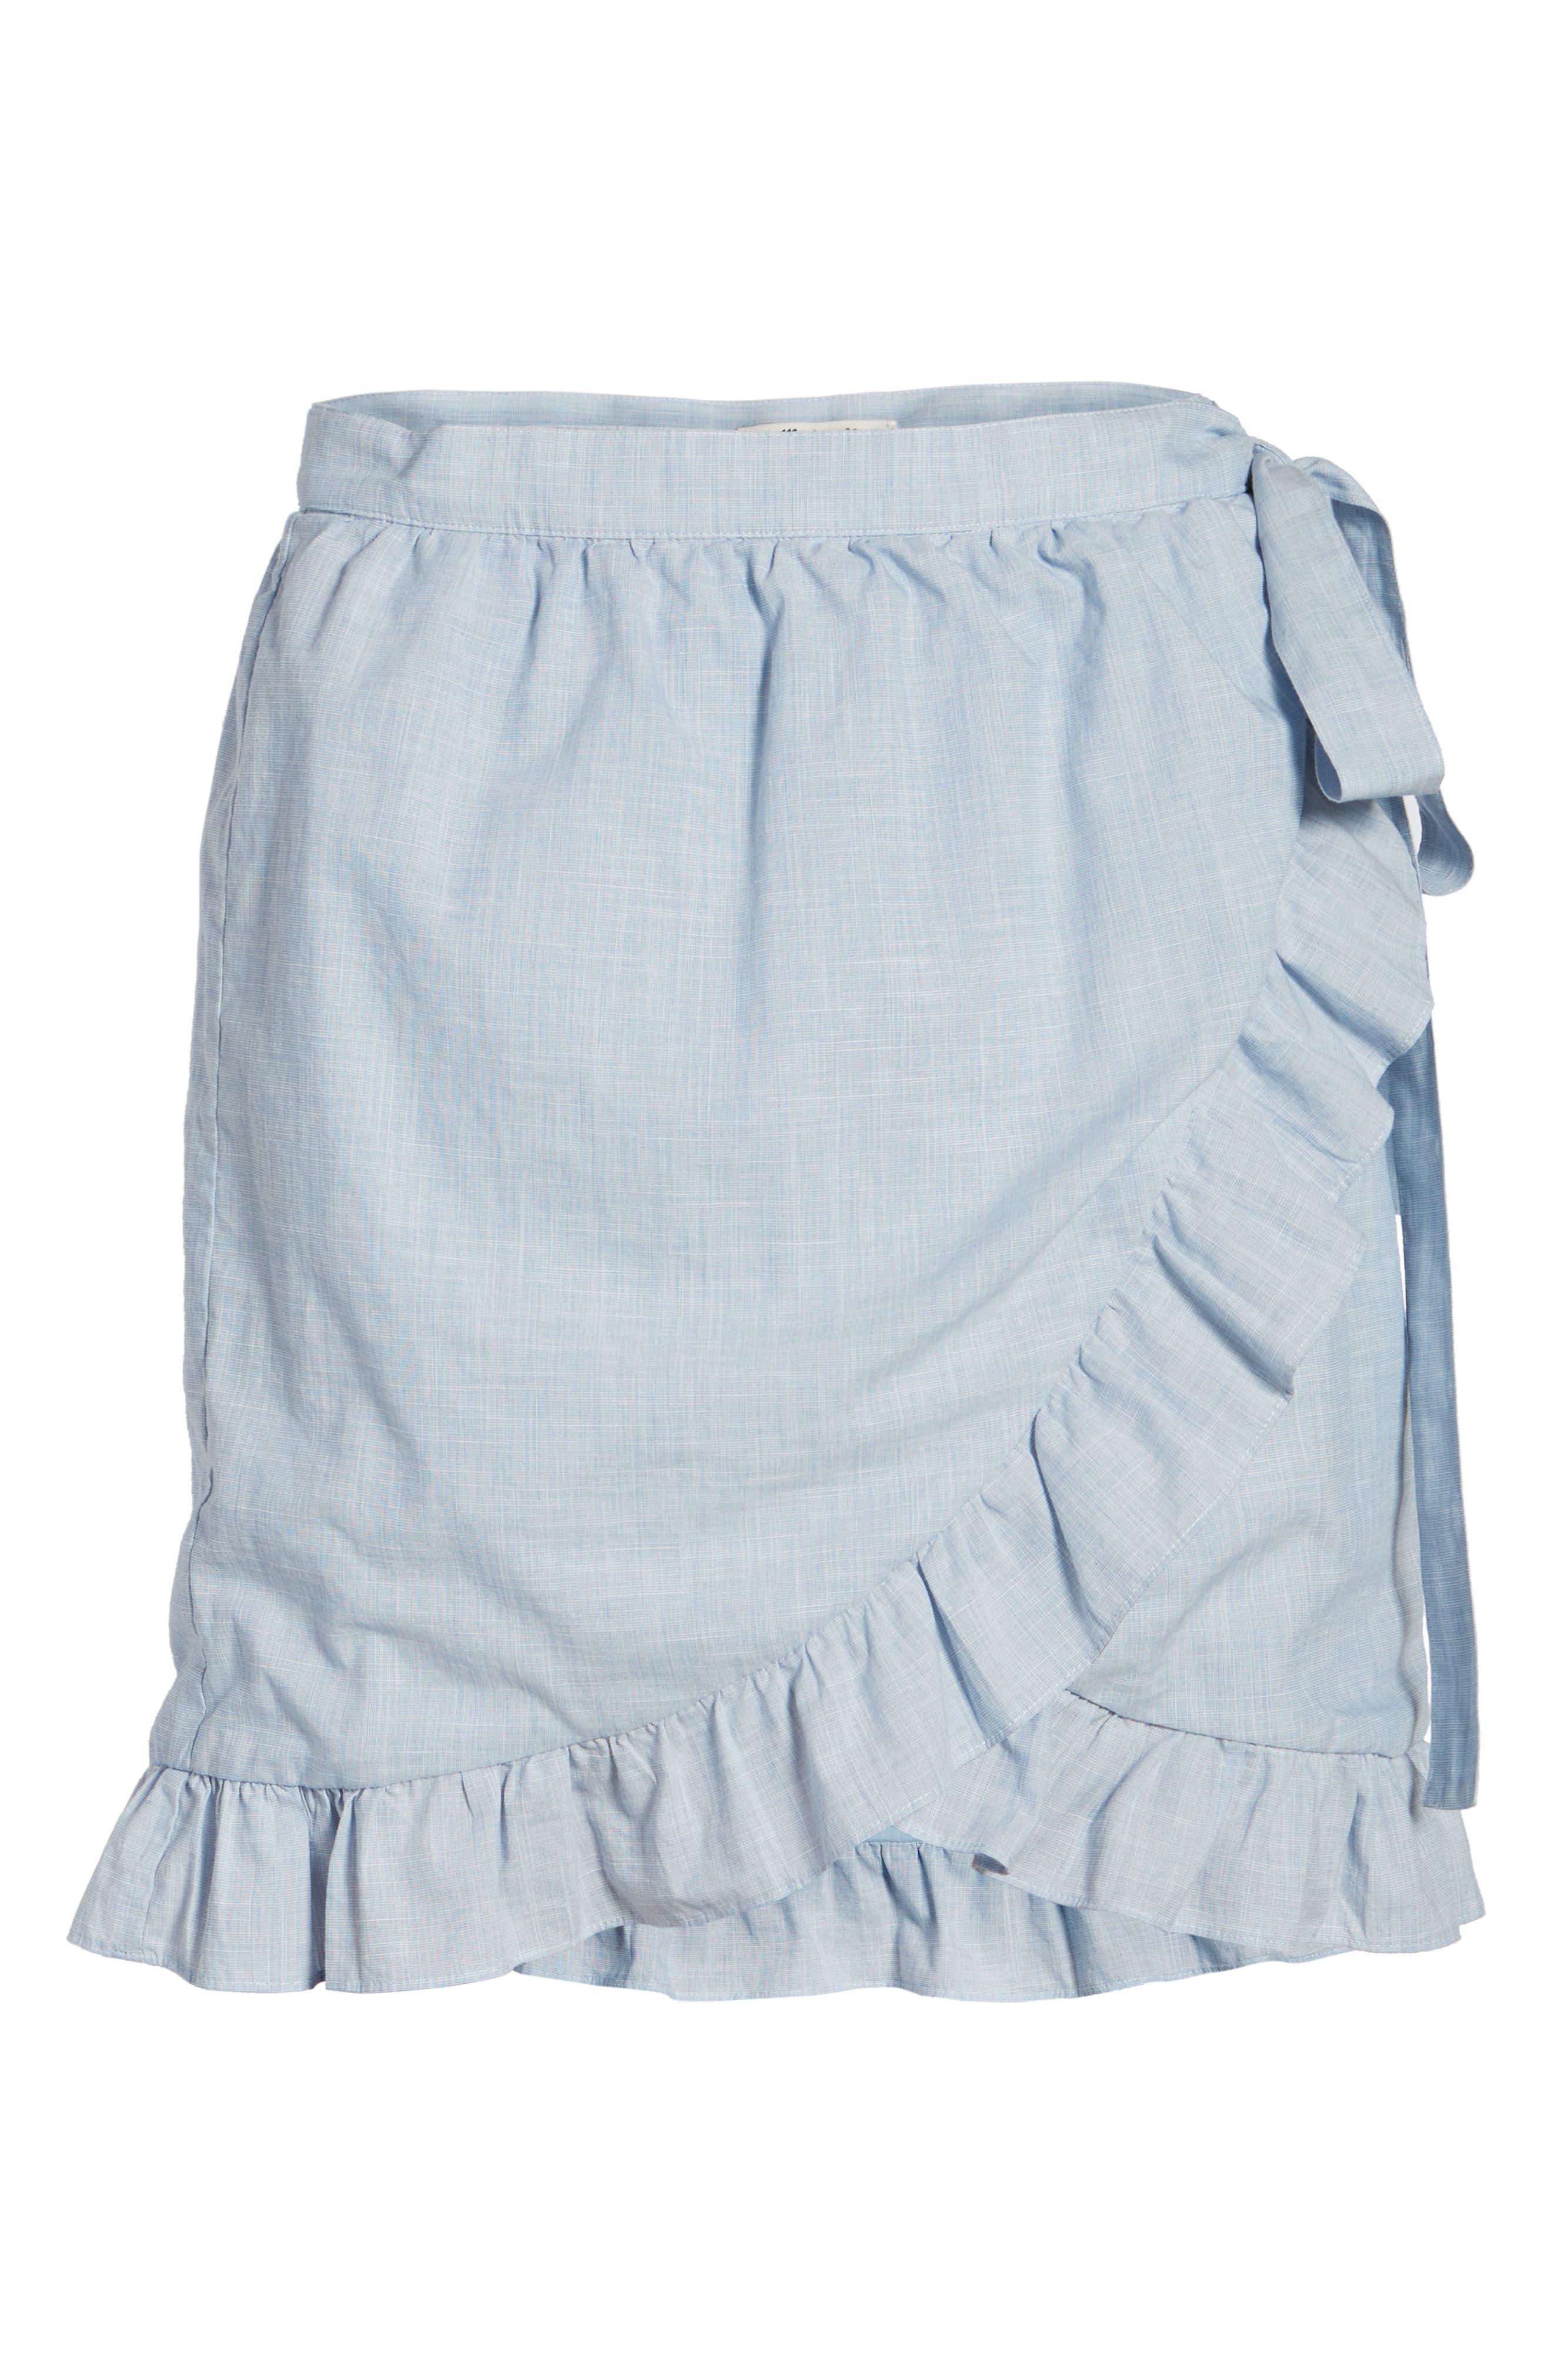 Meadow Wrap Skirt,                             Alternate thumbnail 6, color,                             400